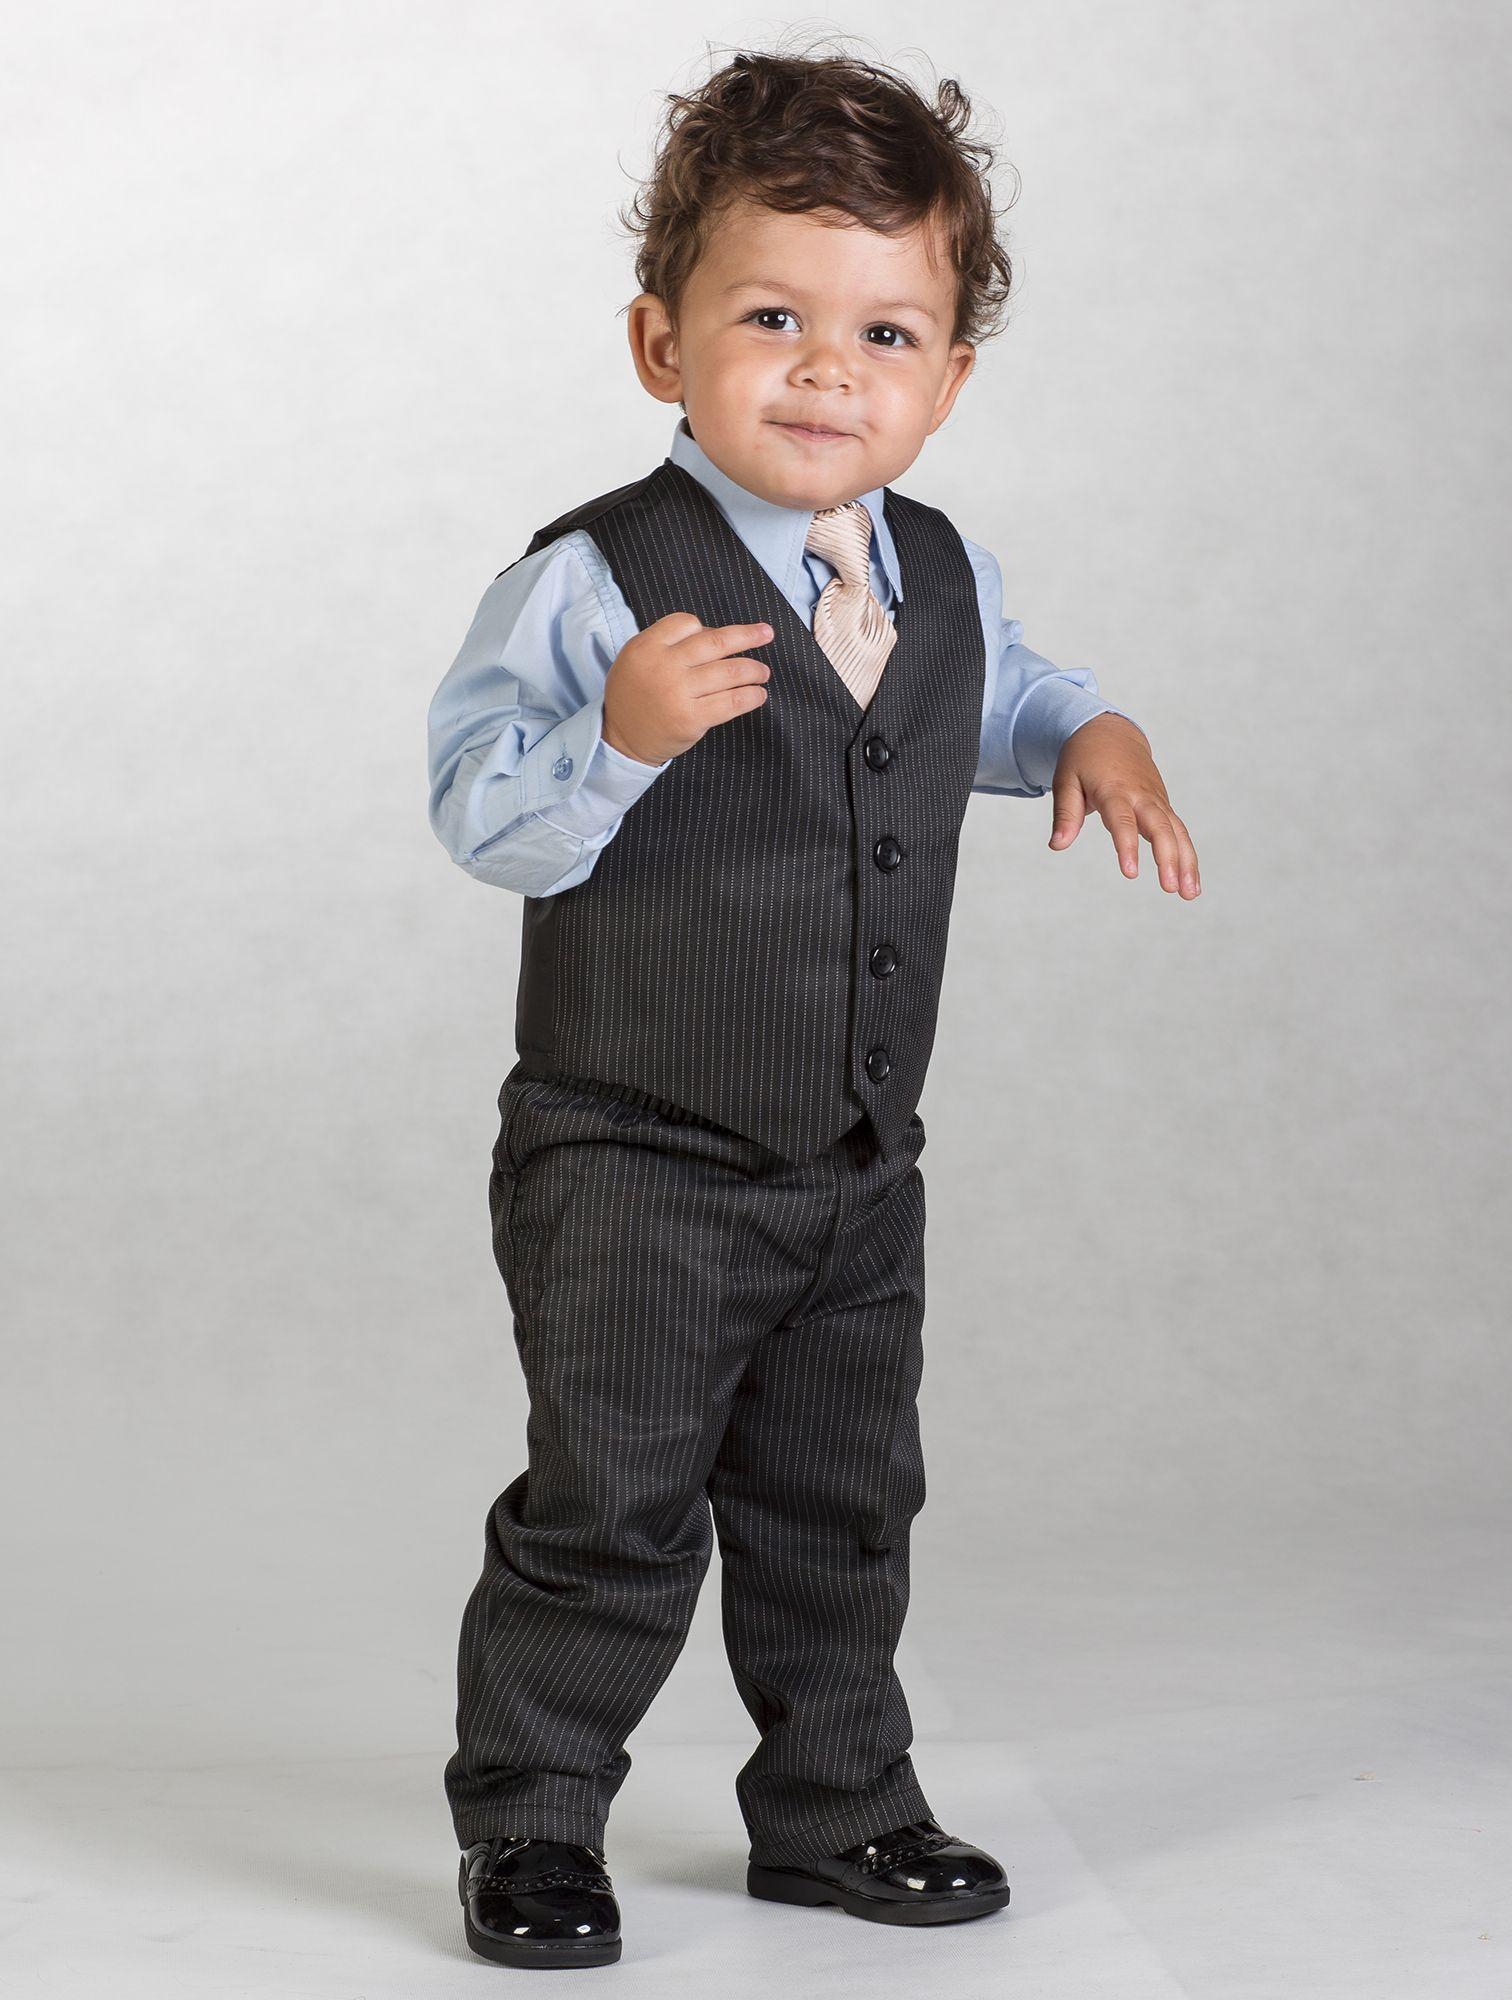 Page Boy Suit | Harry - Black pinstripe & blue 4 piece waistcoat ...